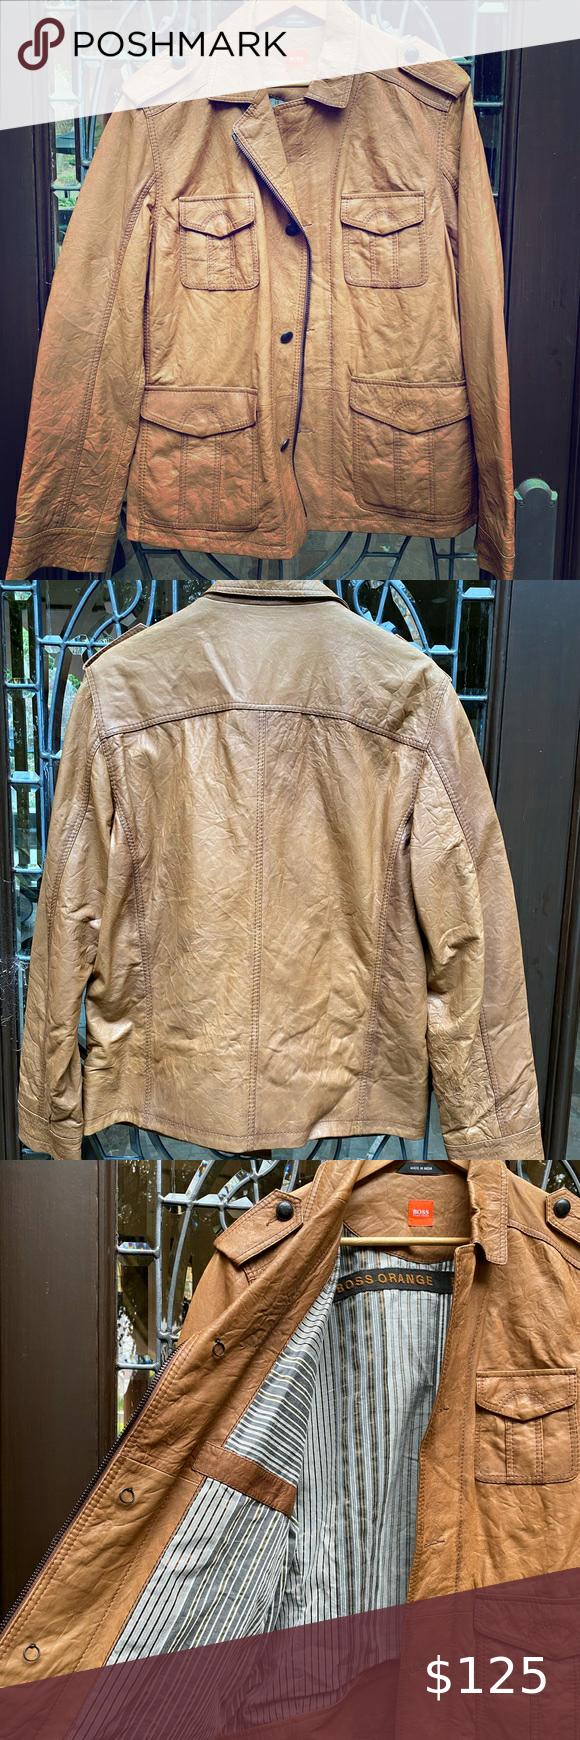 Hugo Boss Orange Line never worn leather jacket Perfect